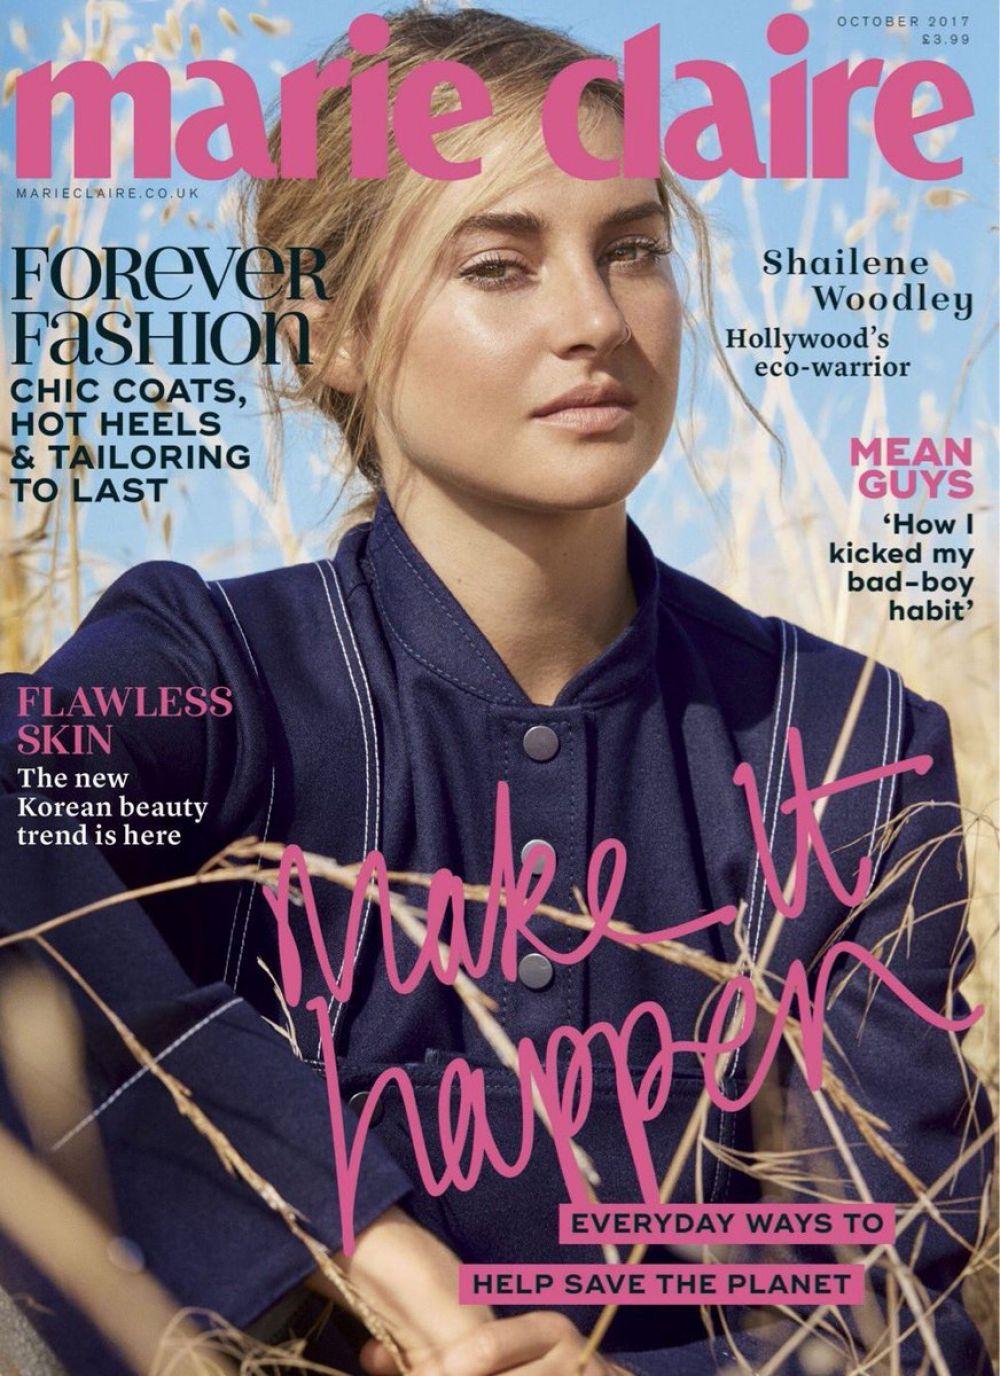 SHAILENE WOODLEY for Marie Claire Magazine, UK October 2017